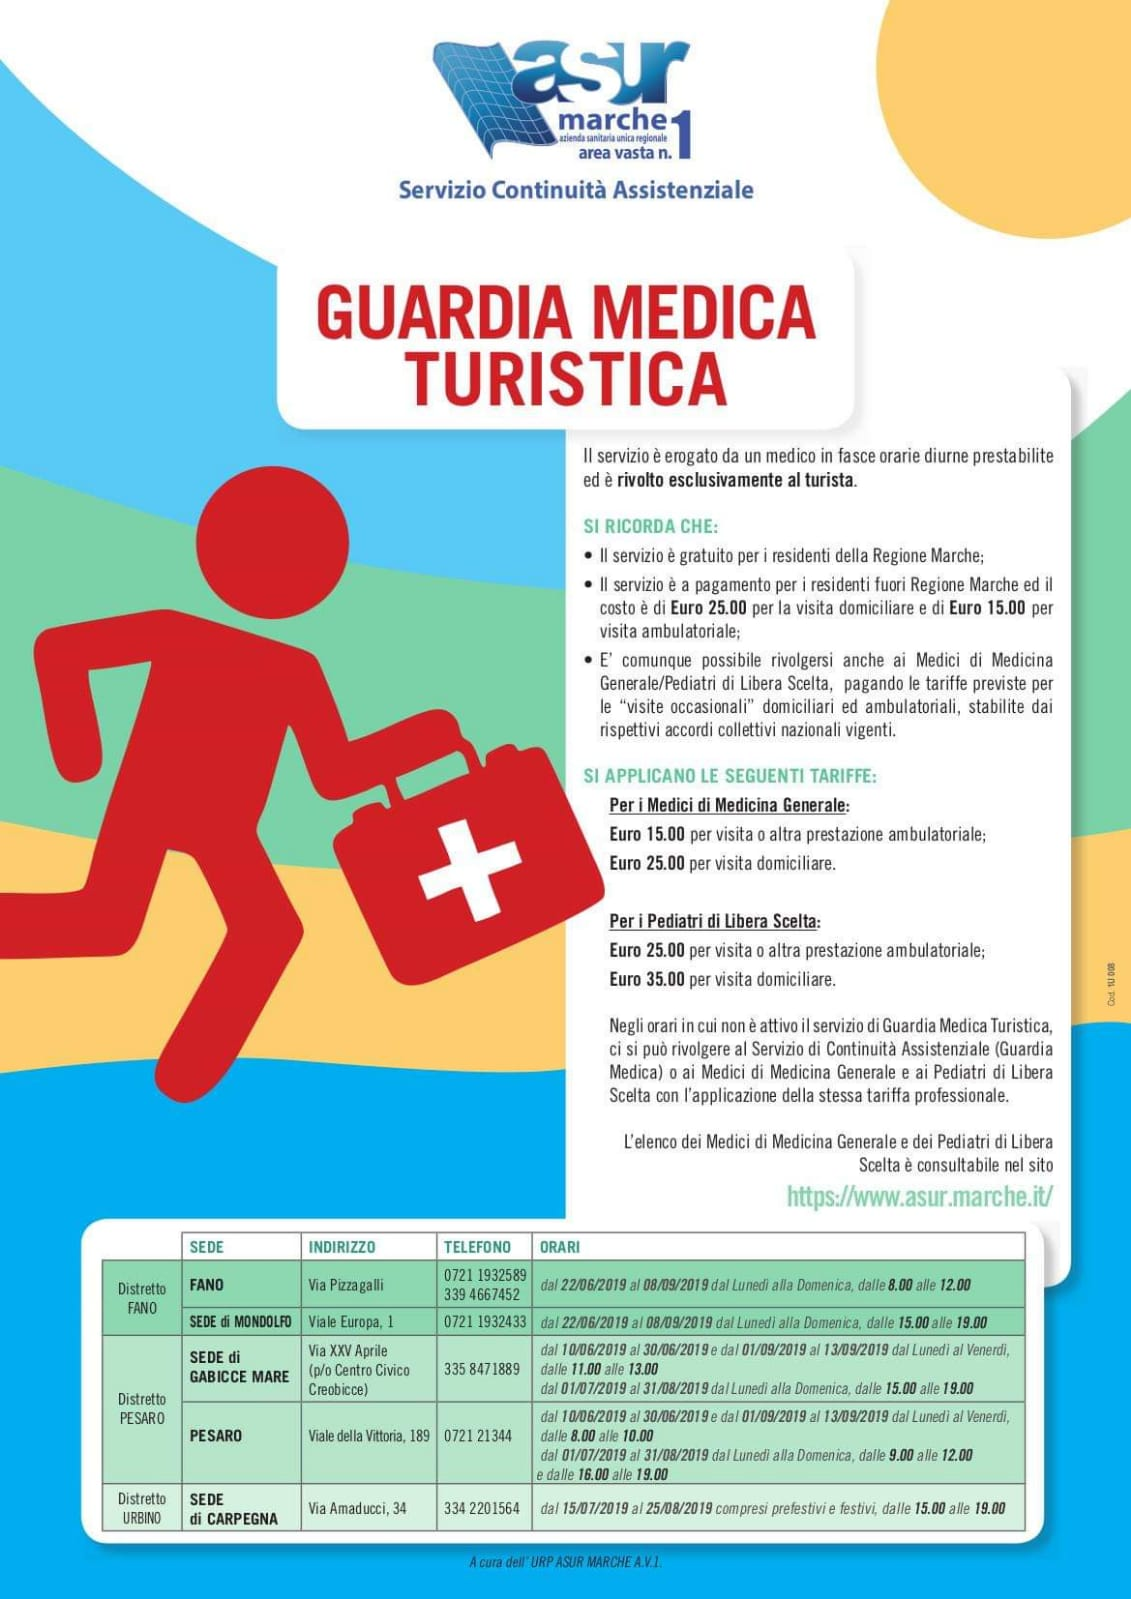 Guardia Medica Turistica 2019